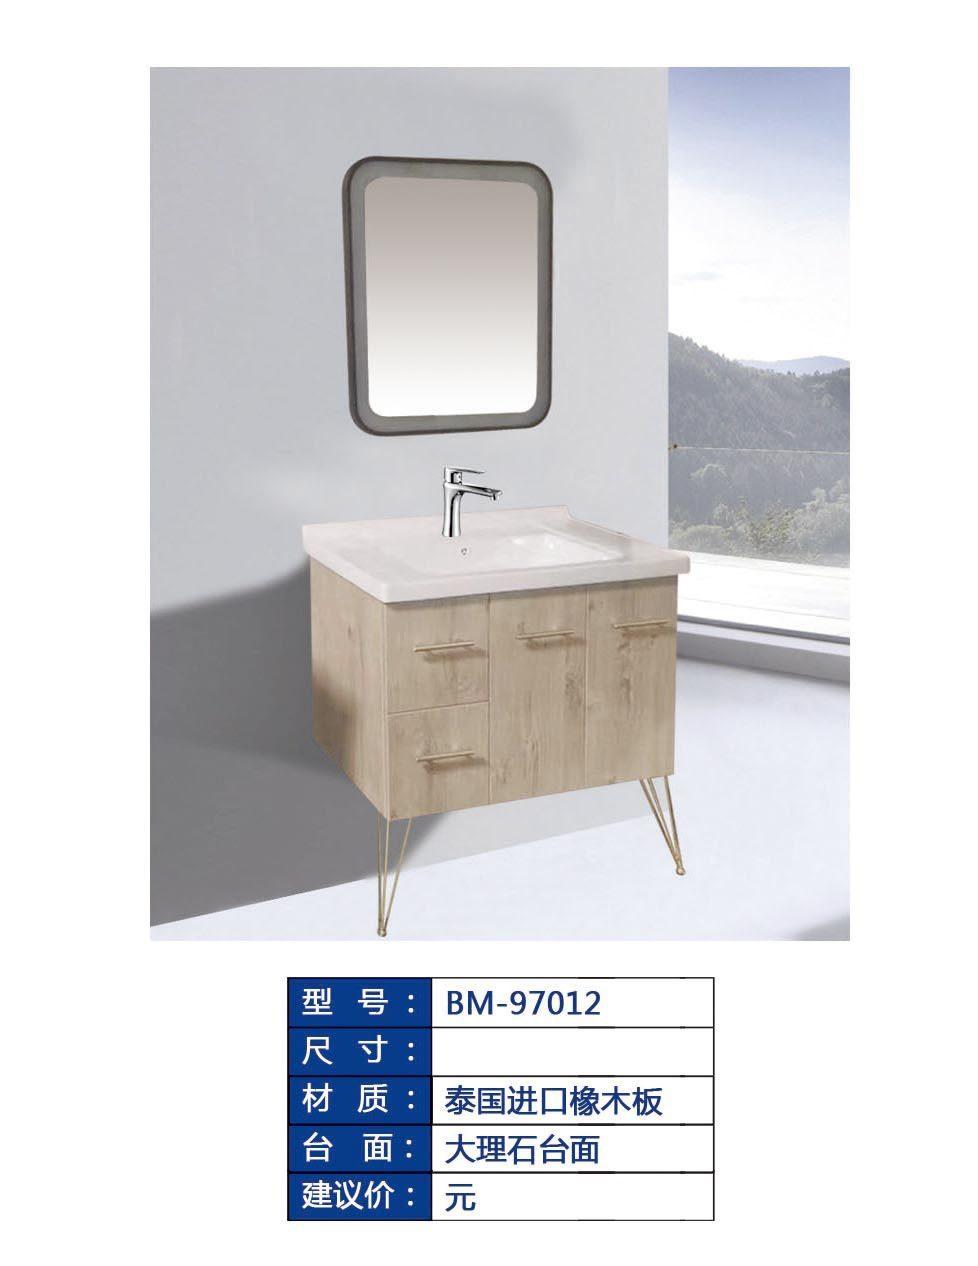 BM-97012